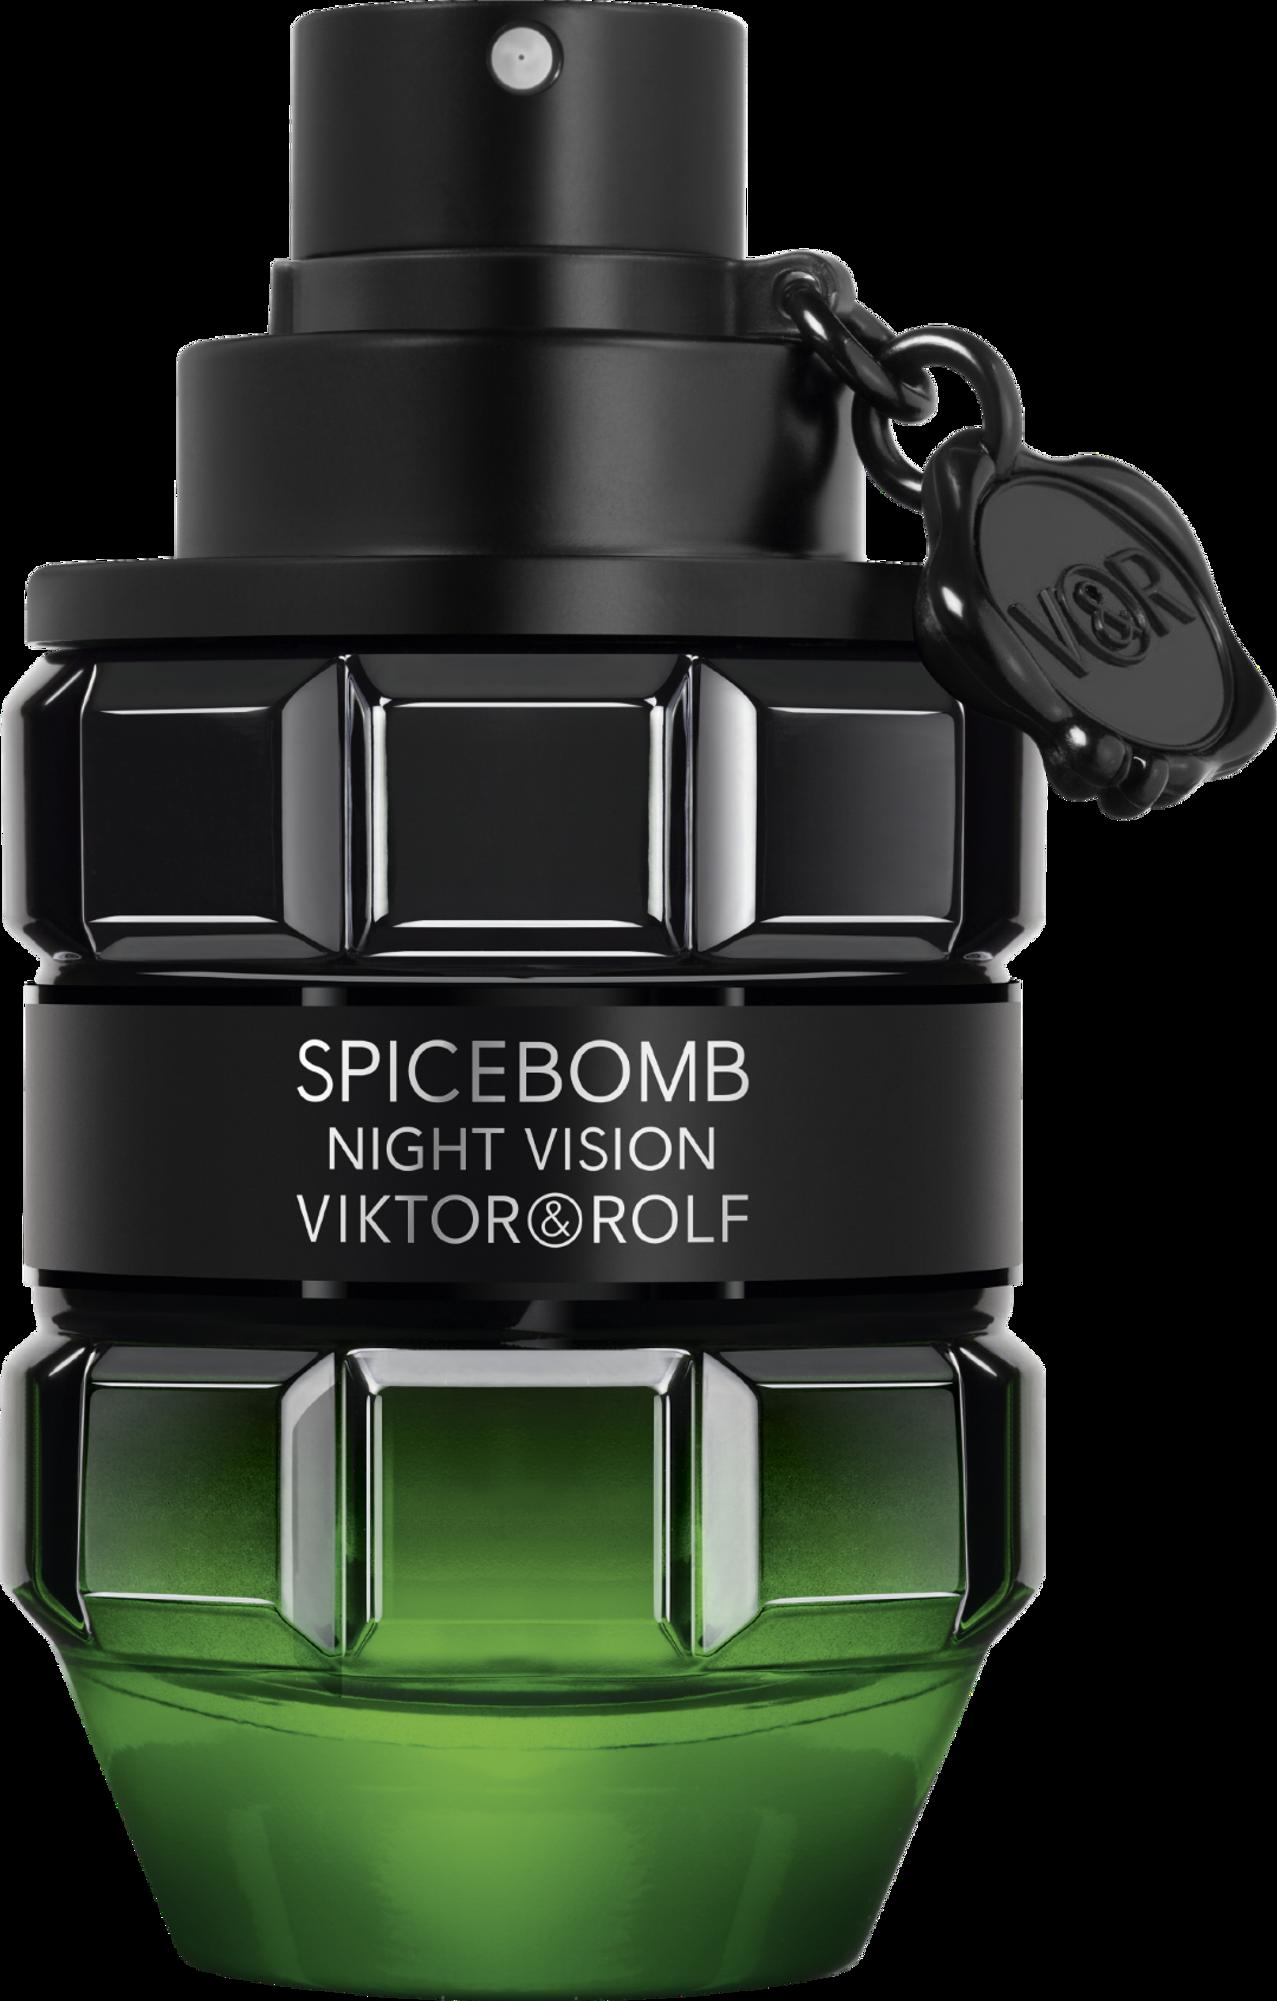 Spicebomb Night Vision Eau de Toilette